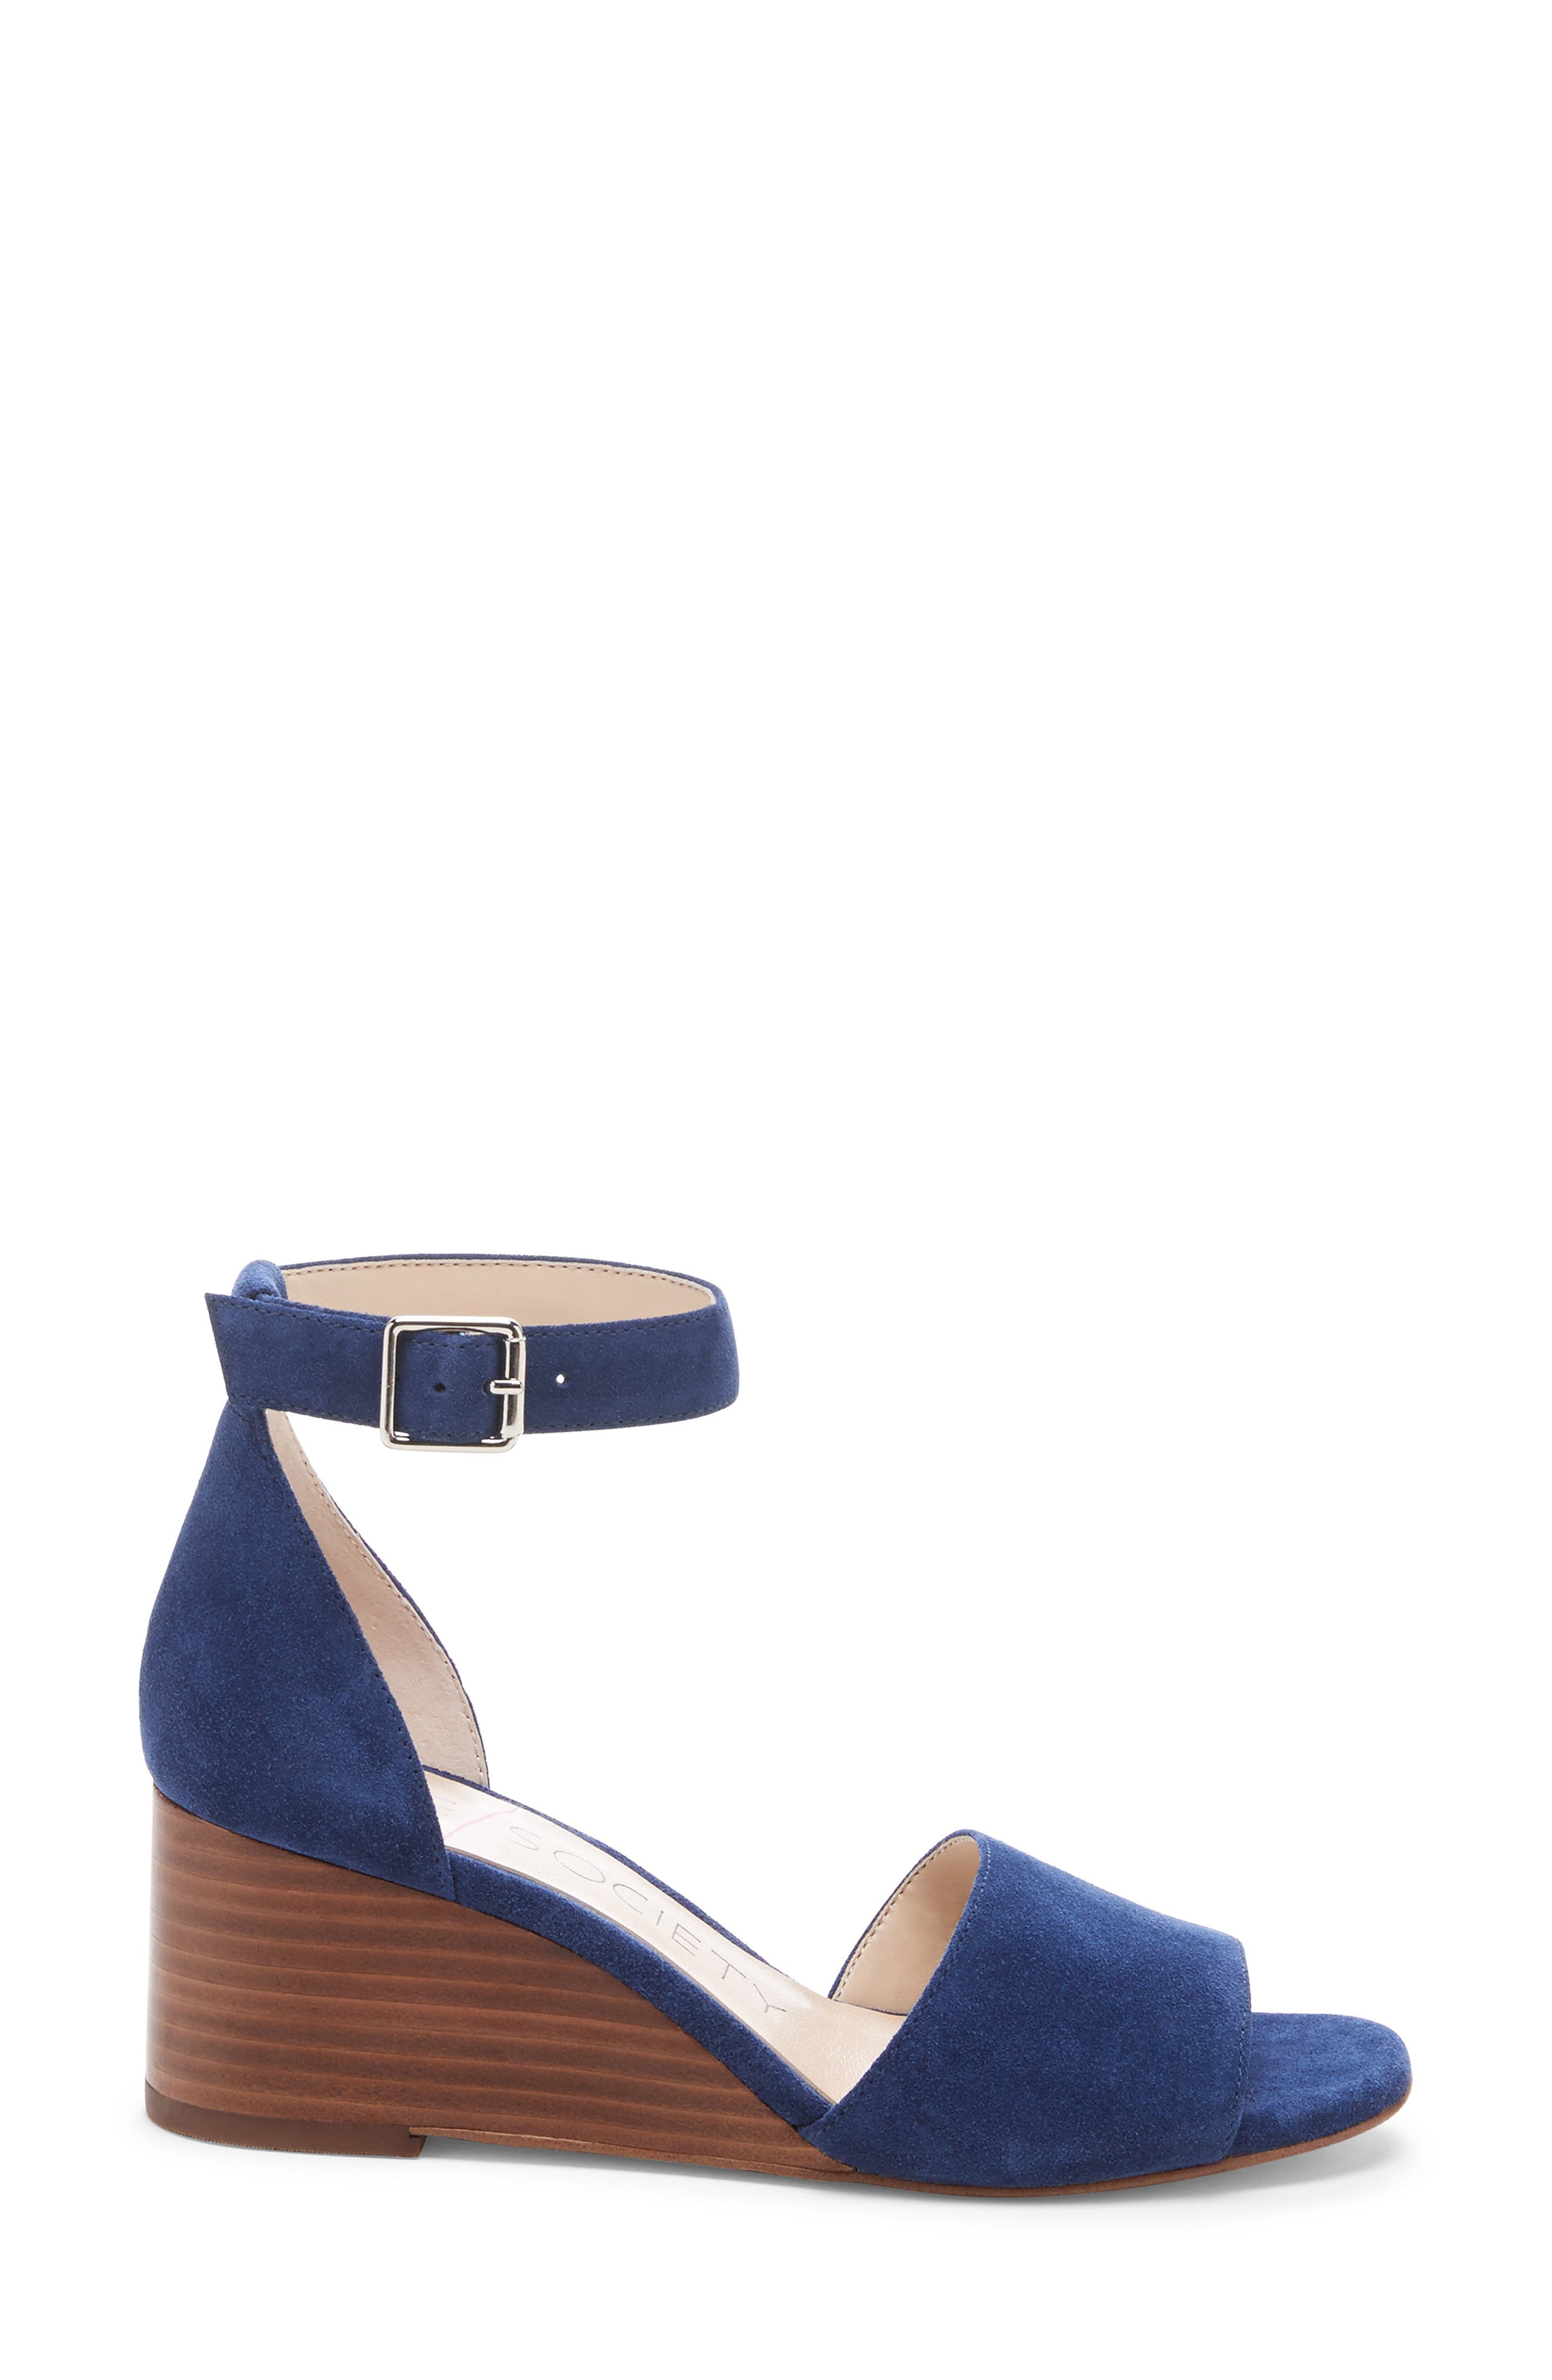 ,                             Kenia Wedge Sandal,                             Alternate thumbnail 3, color,                             BLUE JEAN SUEDE